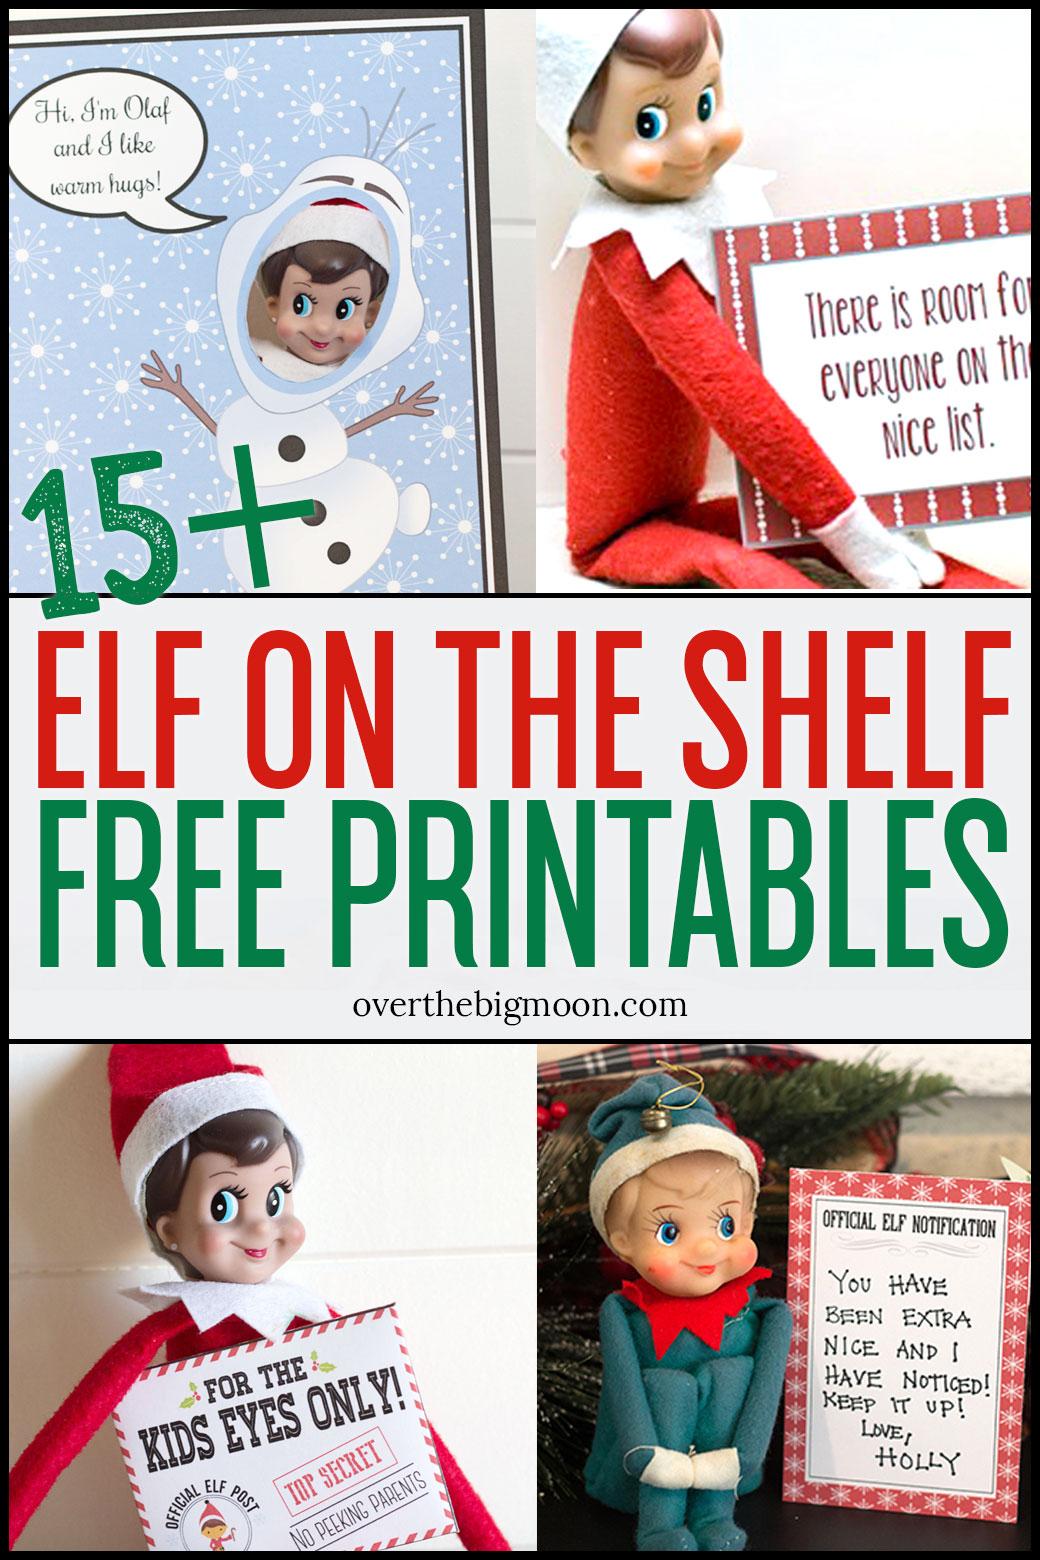 Elf On The Shelf Printables & Ideas - Over The Big Moon - Elf On The Shelf Free Printable Ideas